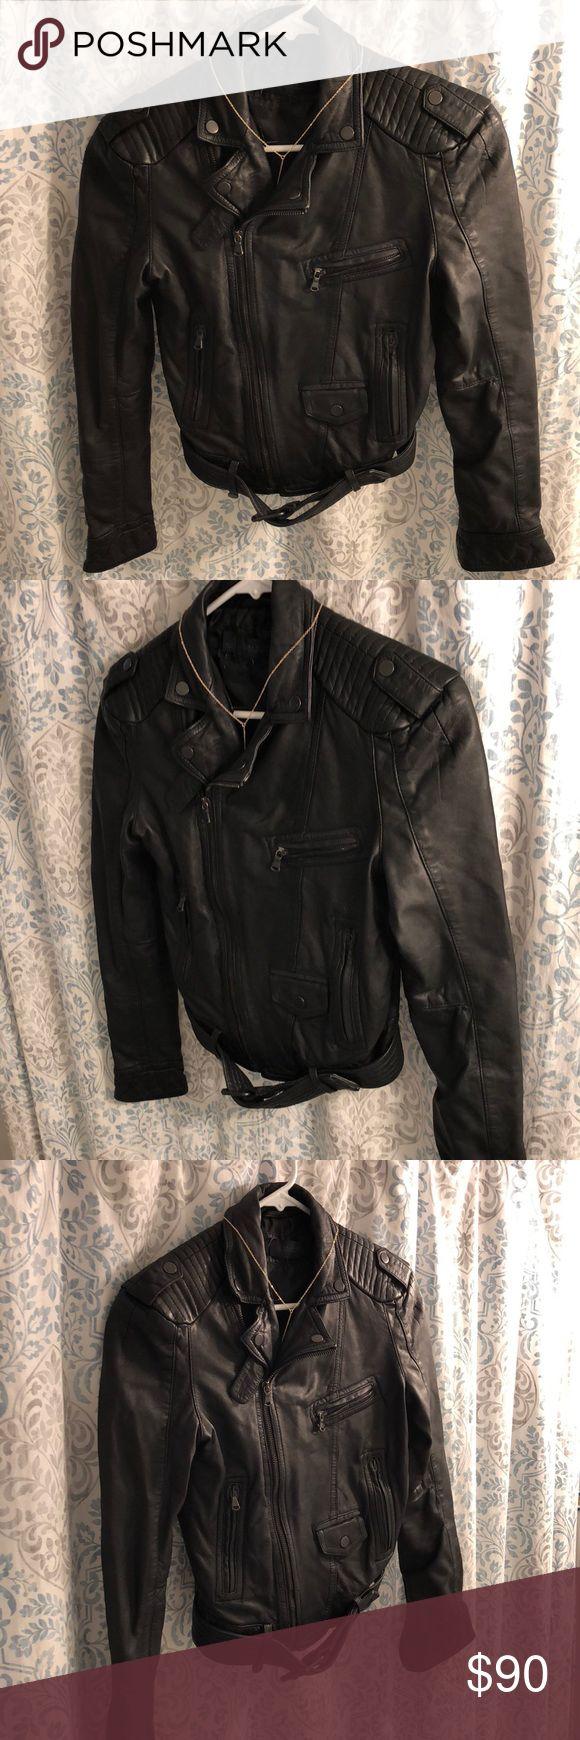 Zara Women Bomber Jacket Good condition, Black Leather Bomber Jacket Zara Jackets & Coats Utility Jackets